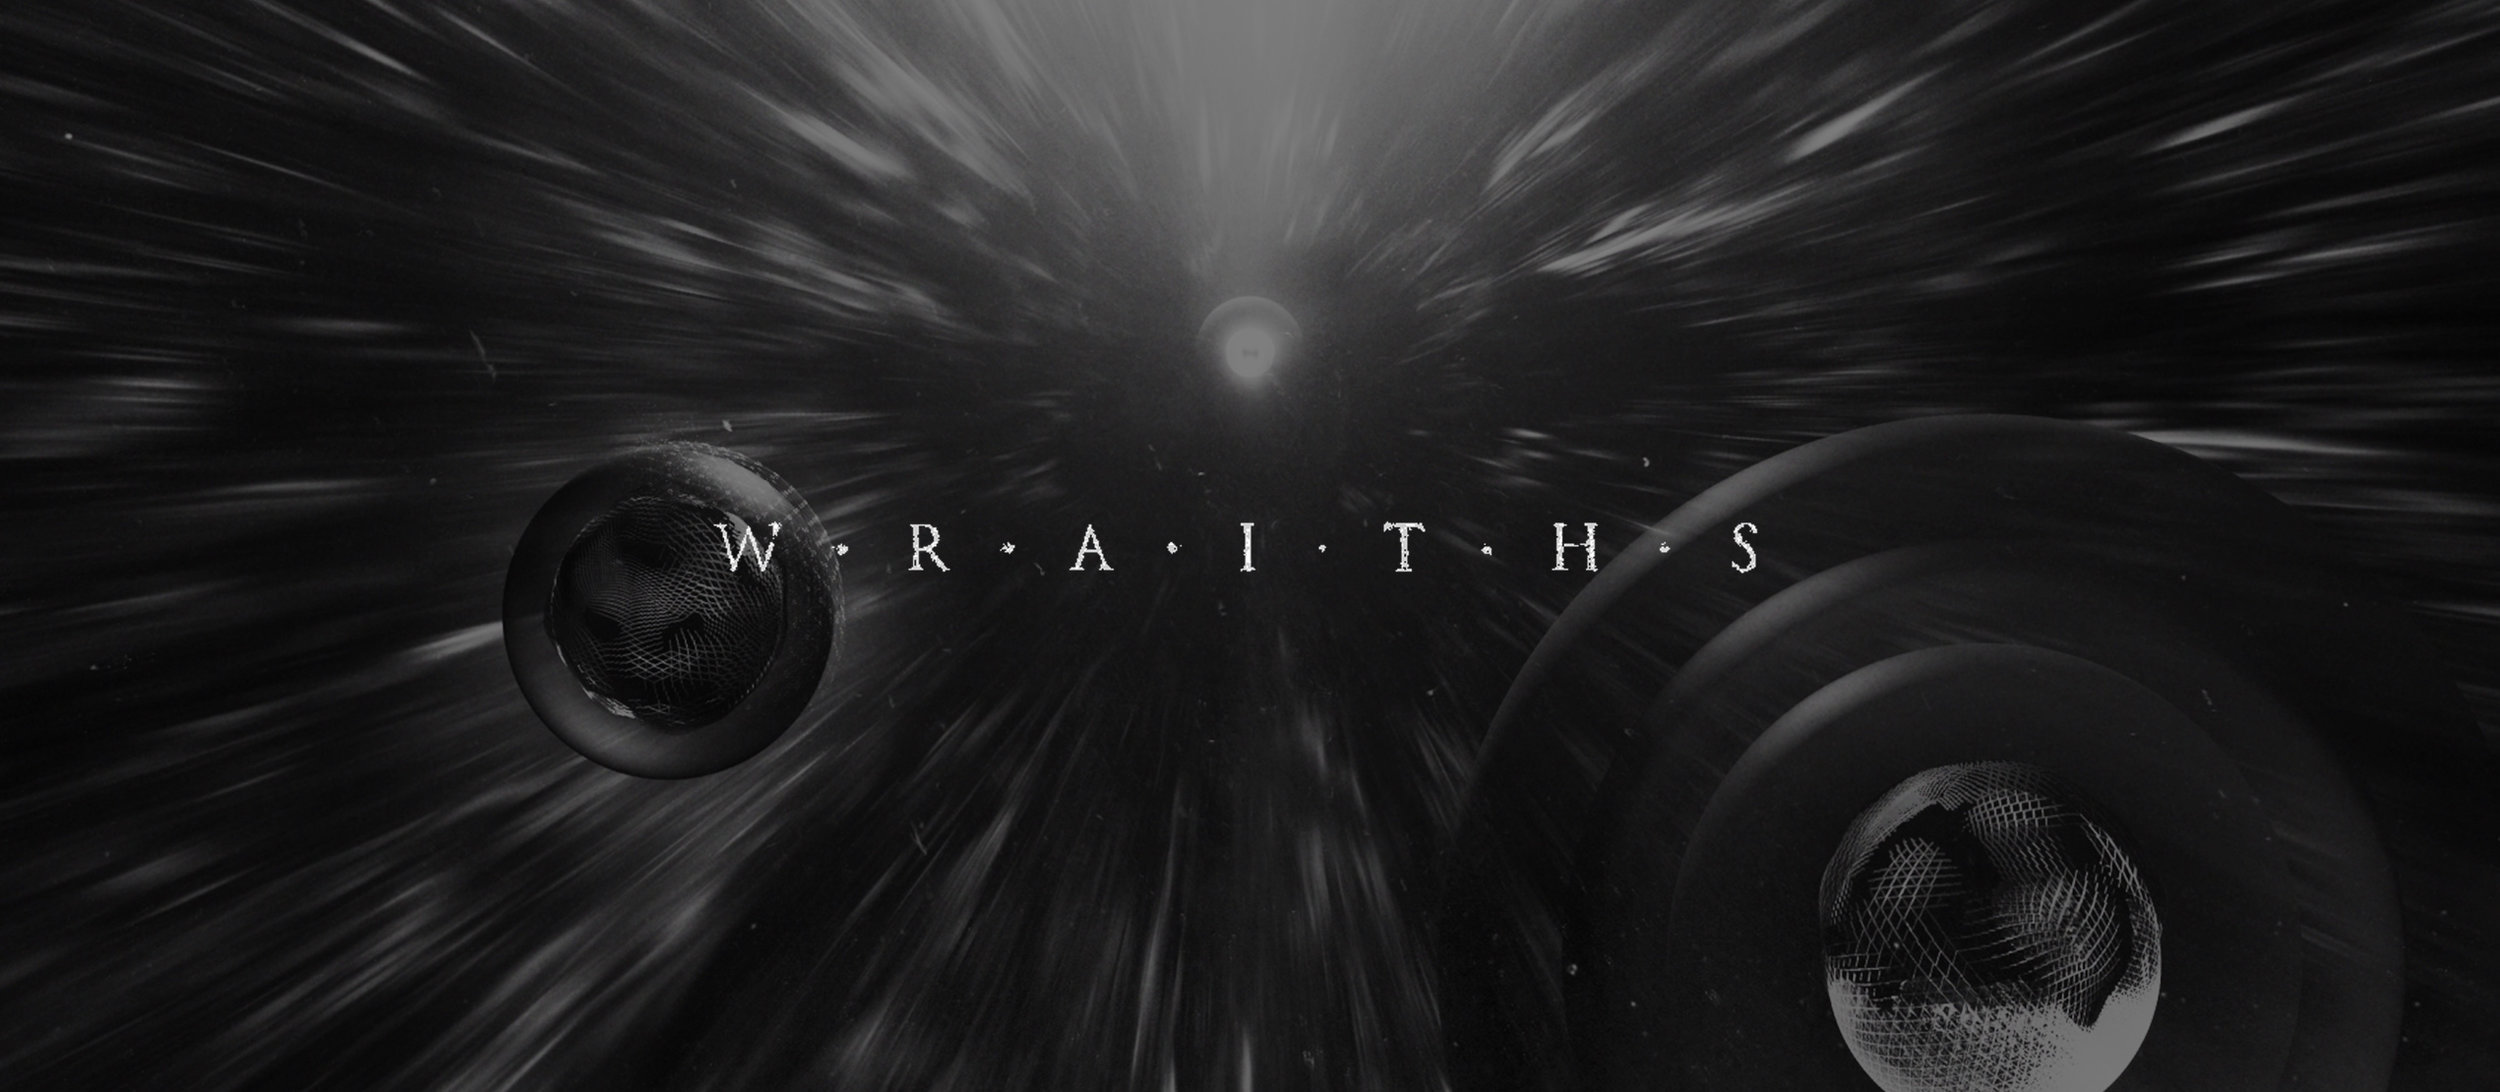 notdanmartin_home_notdanmartin-wraiths.jpg